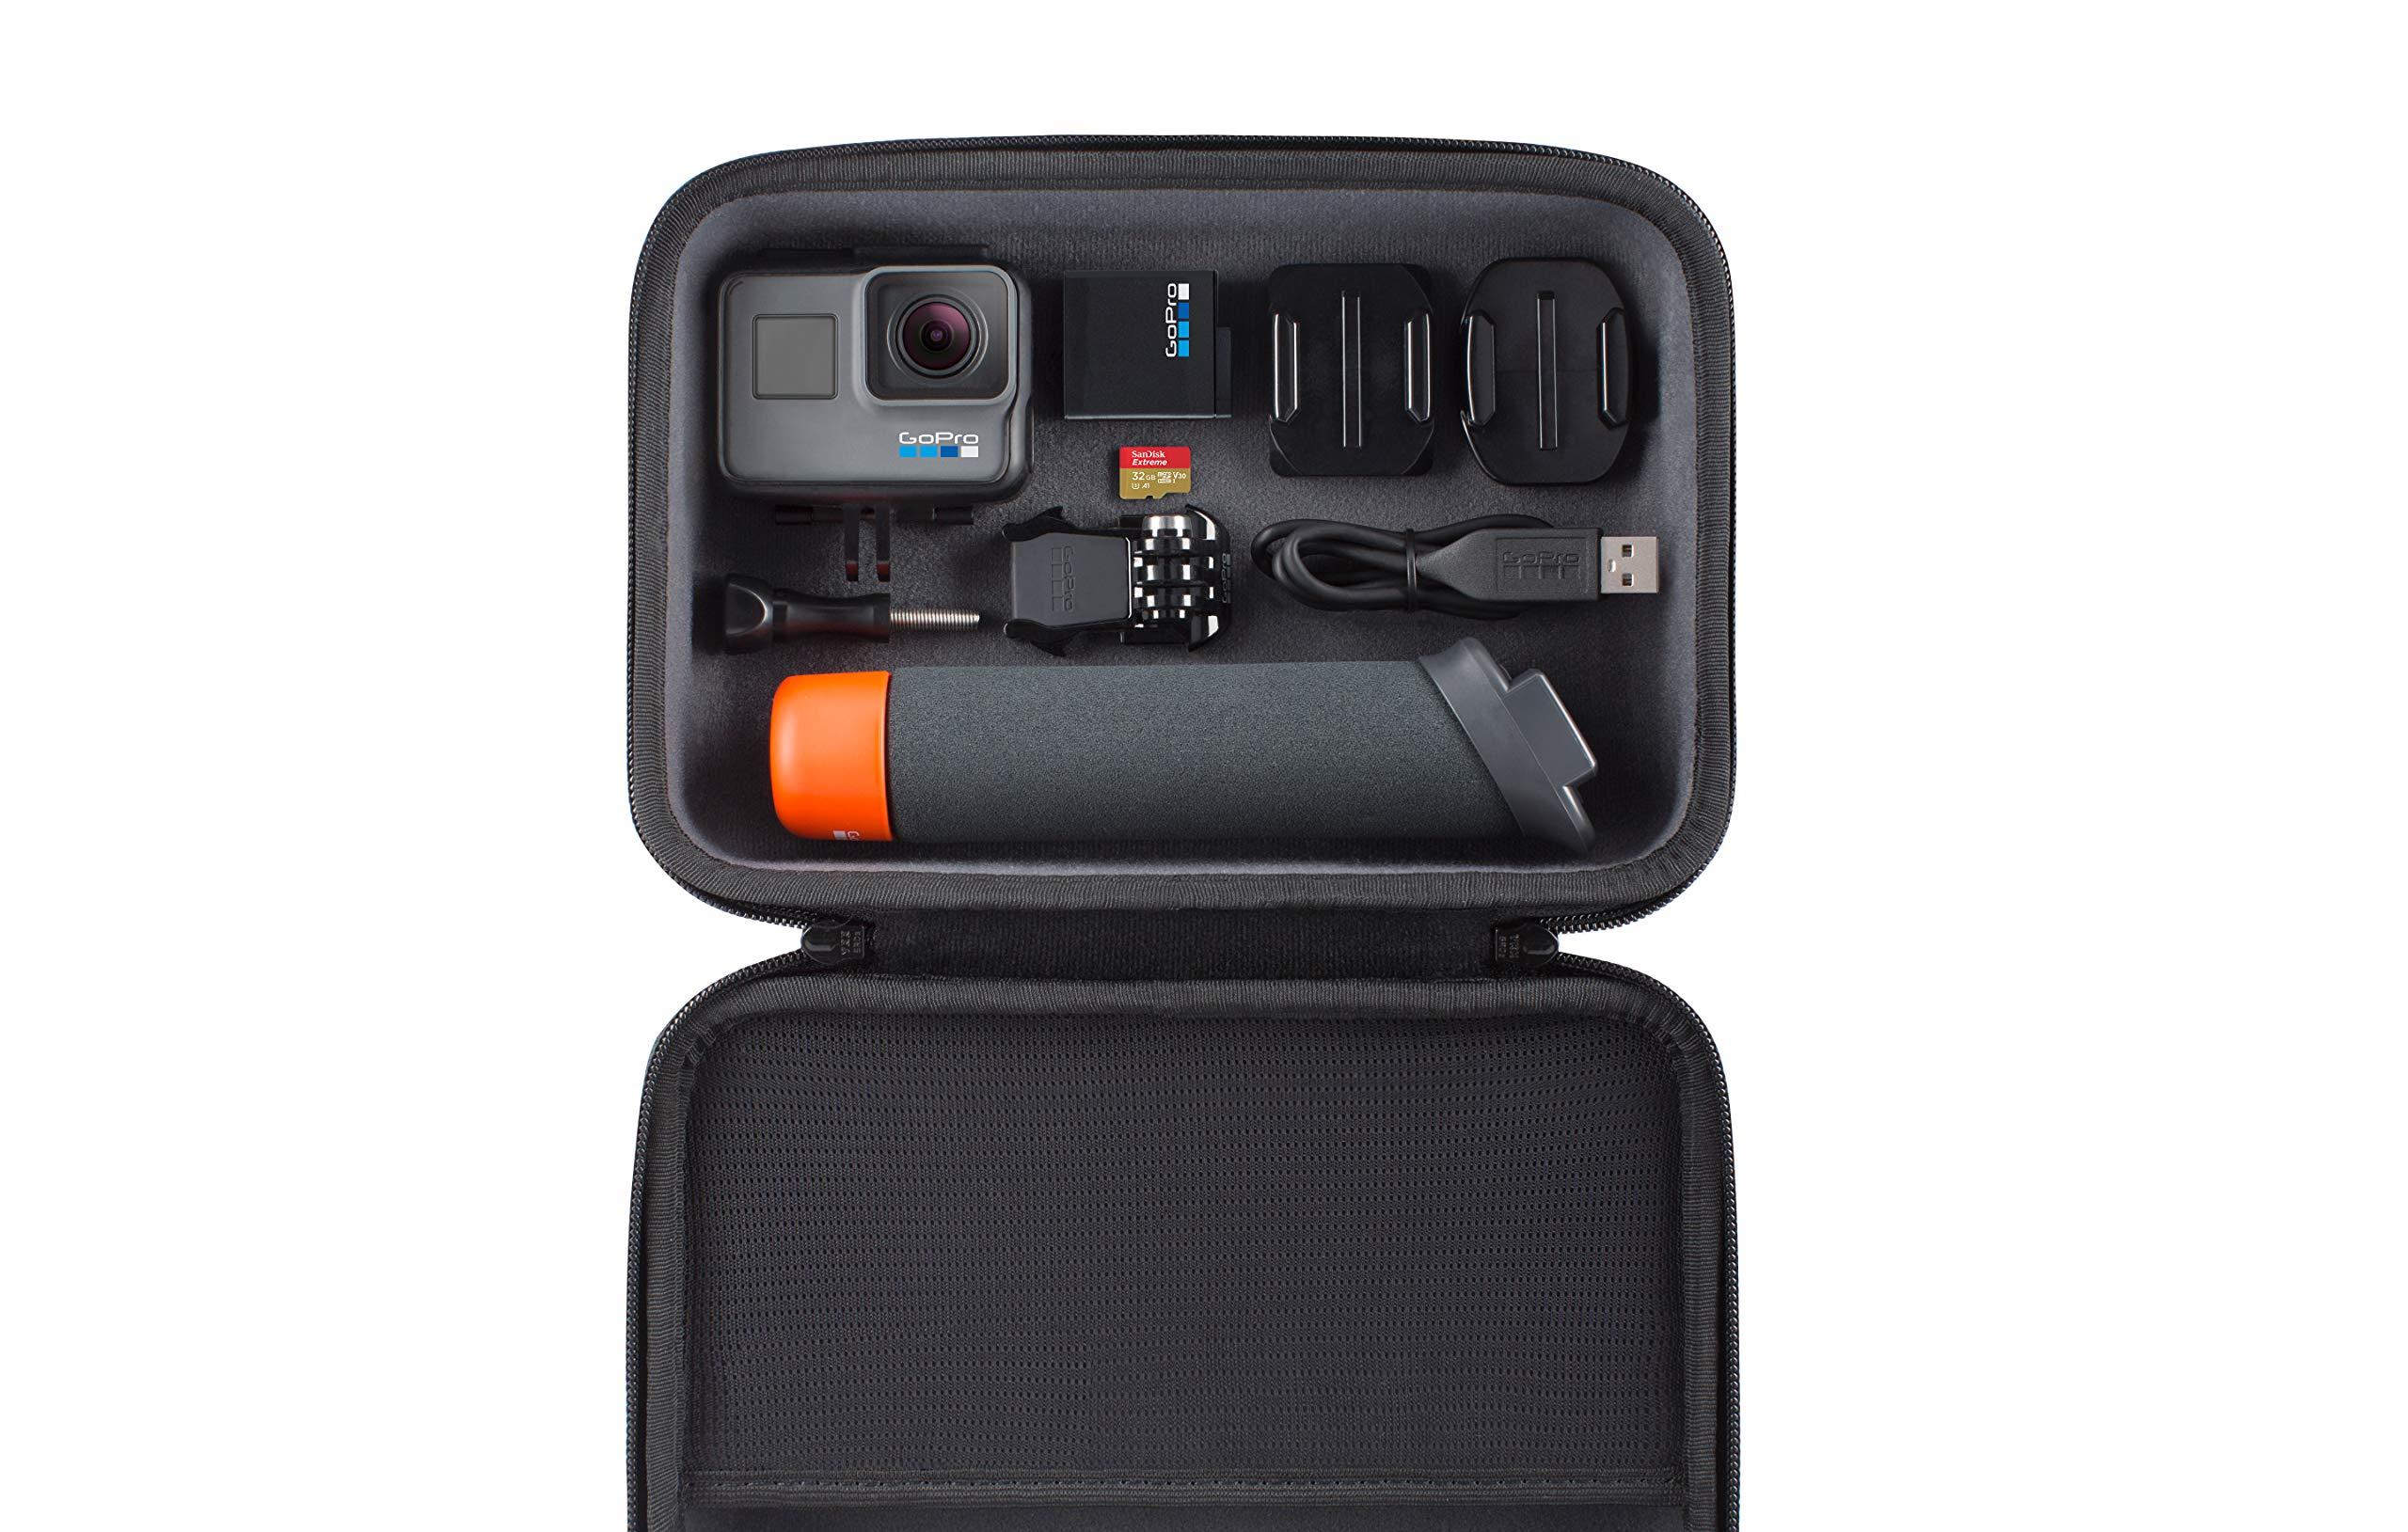 GoPro HERO6 Black + SanDisk 32GB Extreme SD Card + GoPro The Handler Floating Grip